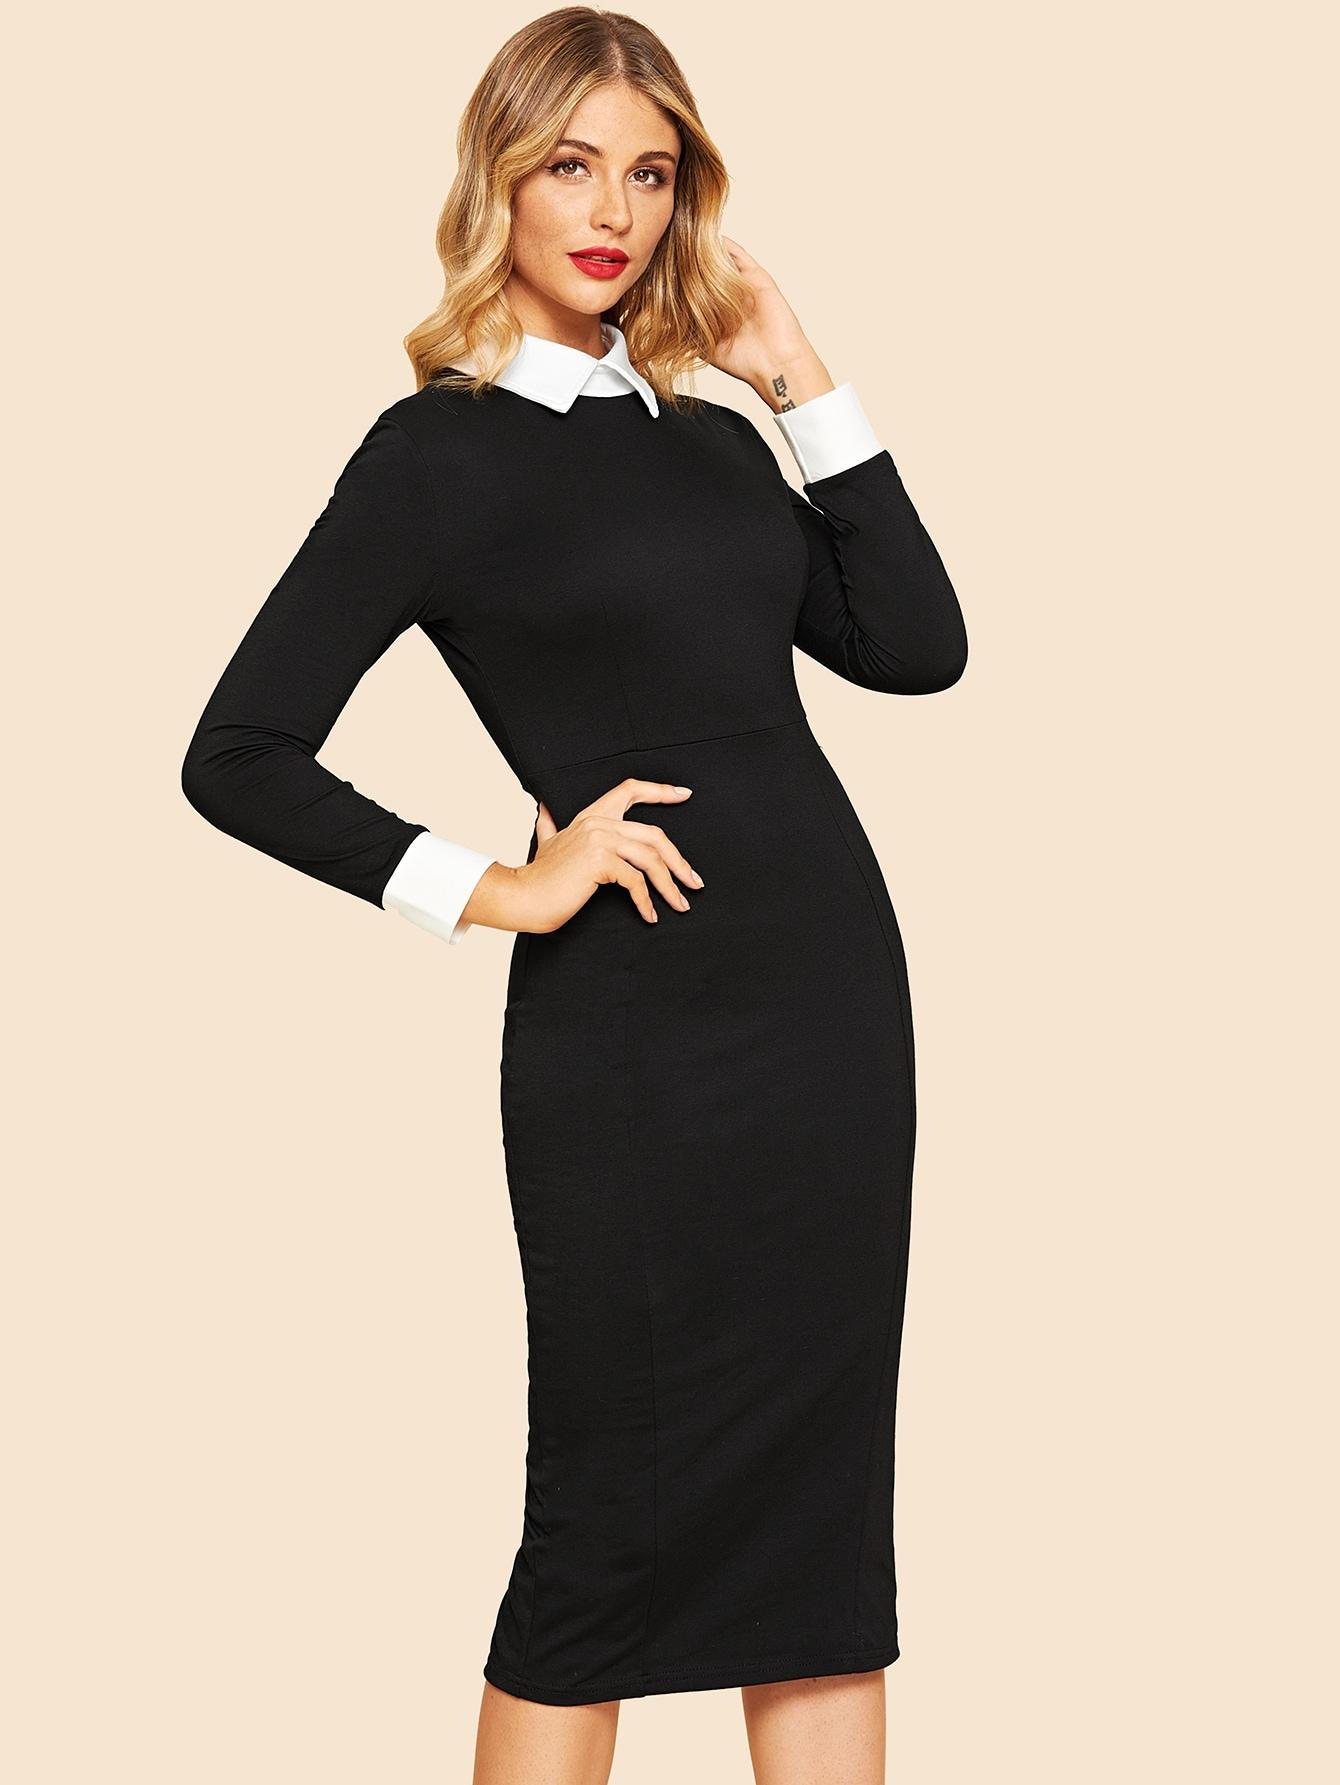 70s Colorblock Contrast Collar Dress 70s Colorblock Contrast Collar Dress